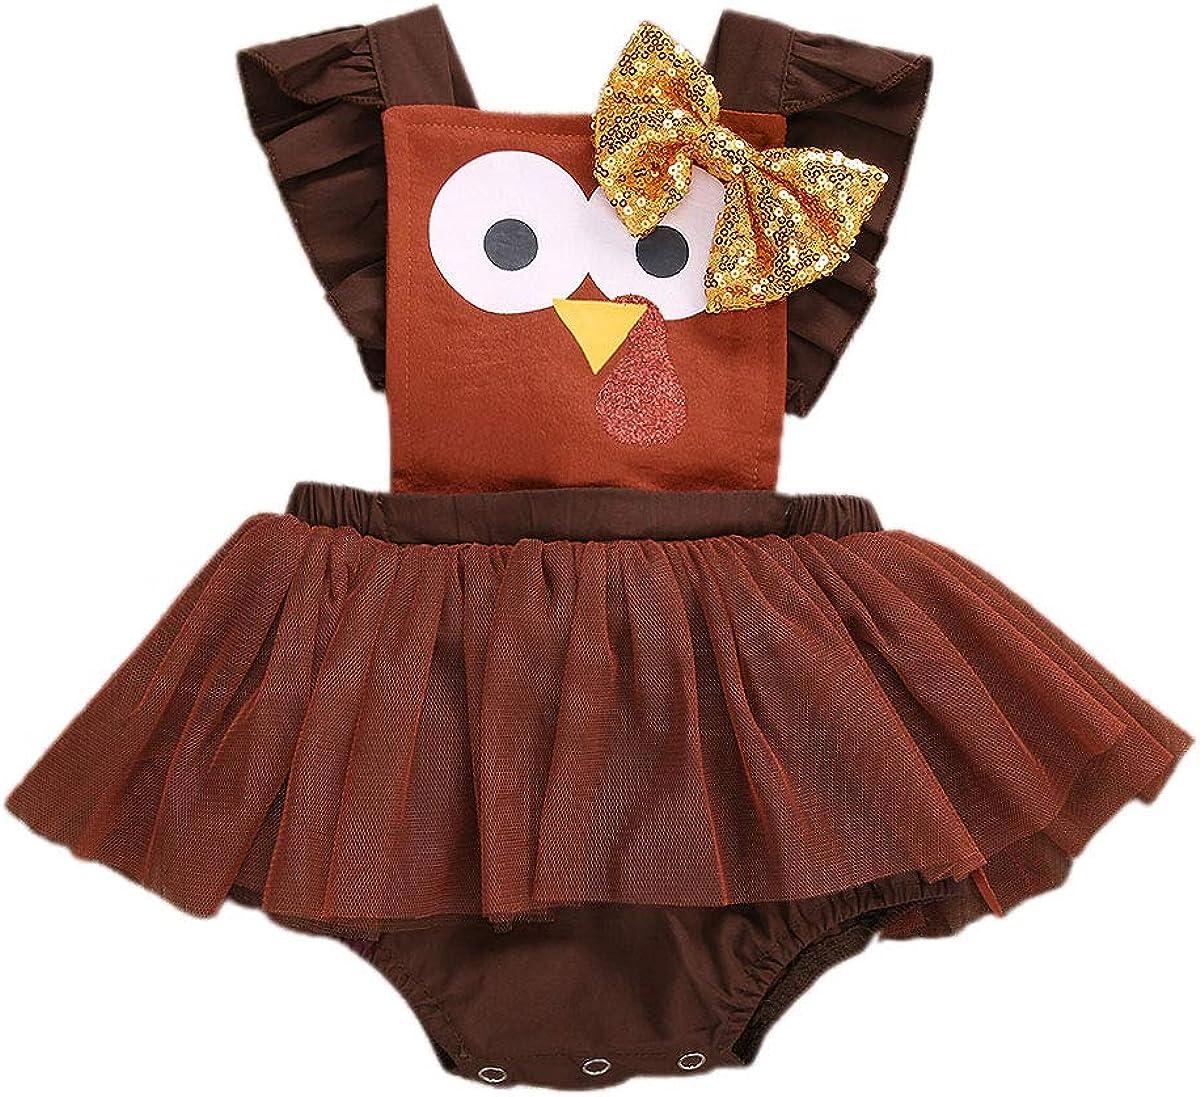 Max Over item handling 50% OFF Newborn Baby Girl Thanksgiving Romper Turkey Sleeveless O Halter